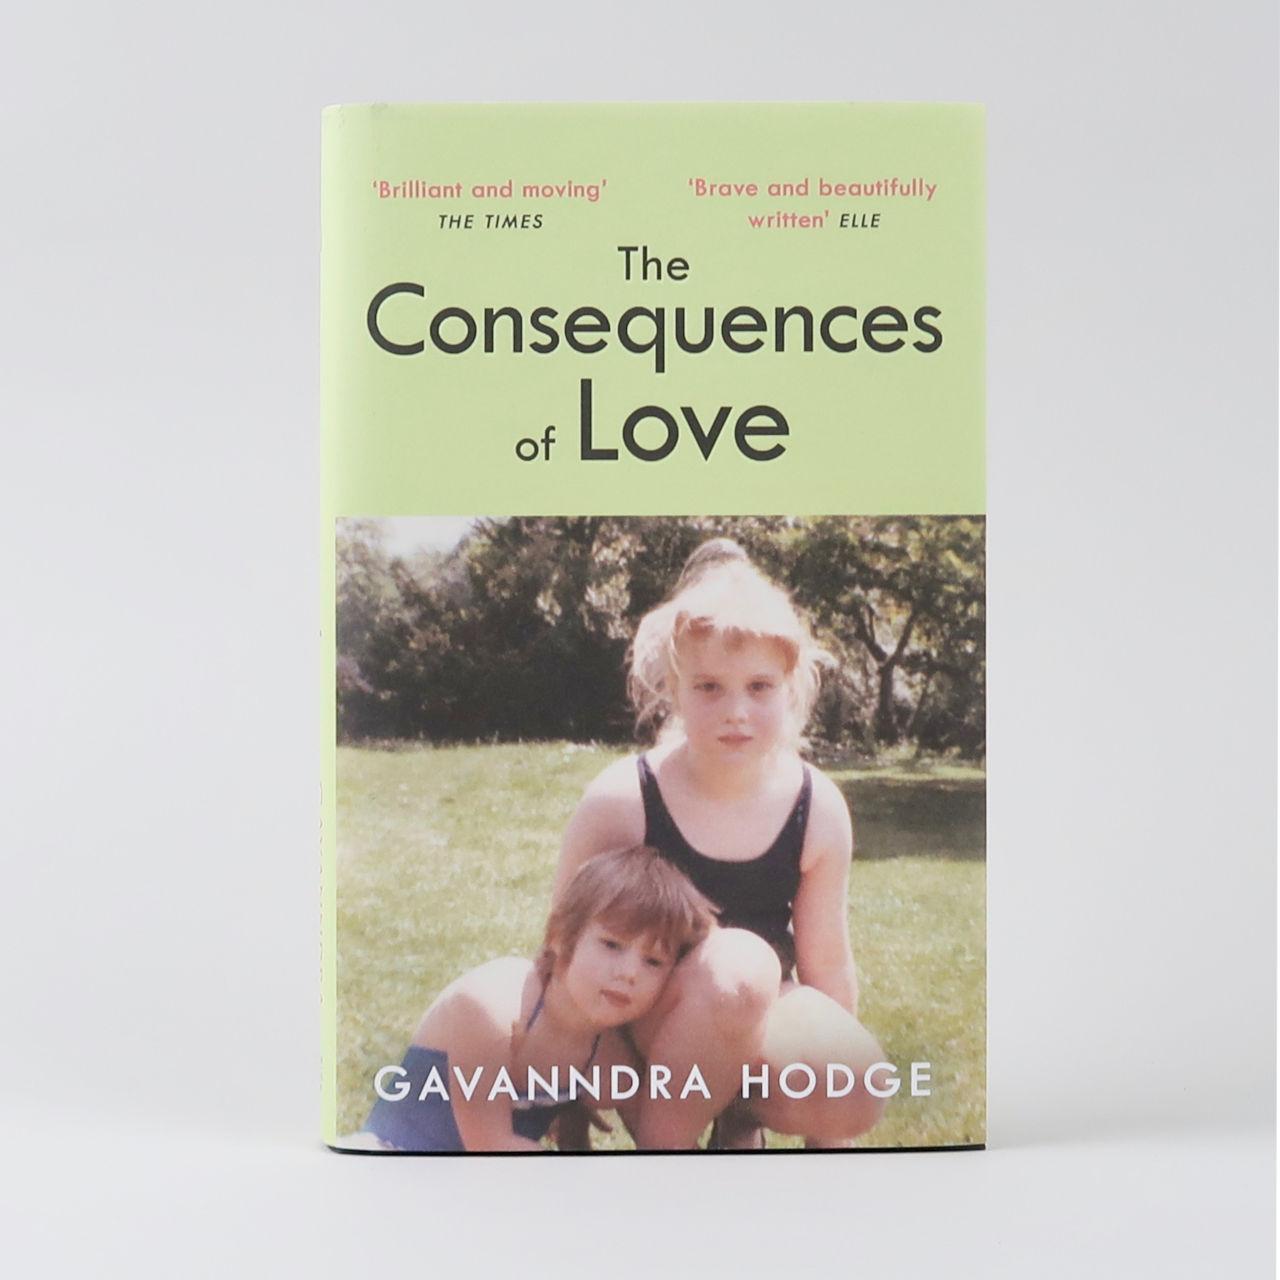 The Consequences of Love - Gavanndra Hodge